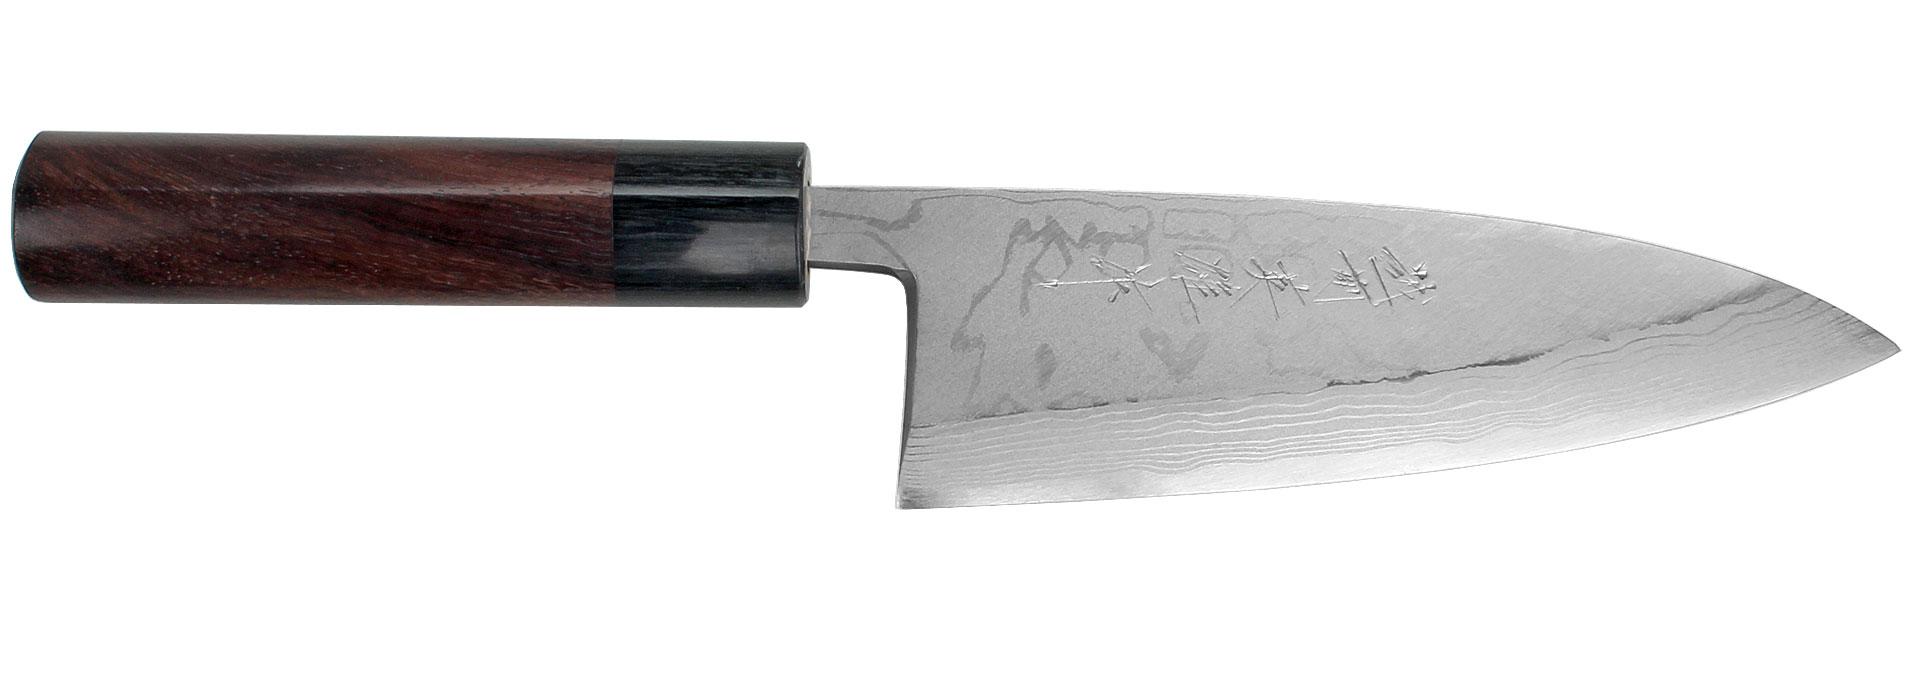 Dorable Handmade Kitchen Knives Australia Image Collection - Kitchen ...